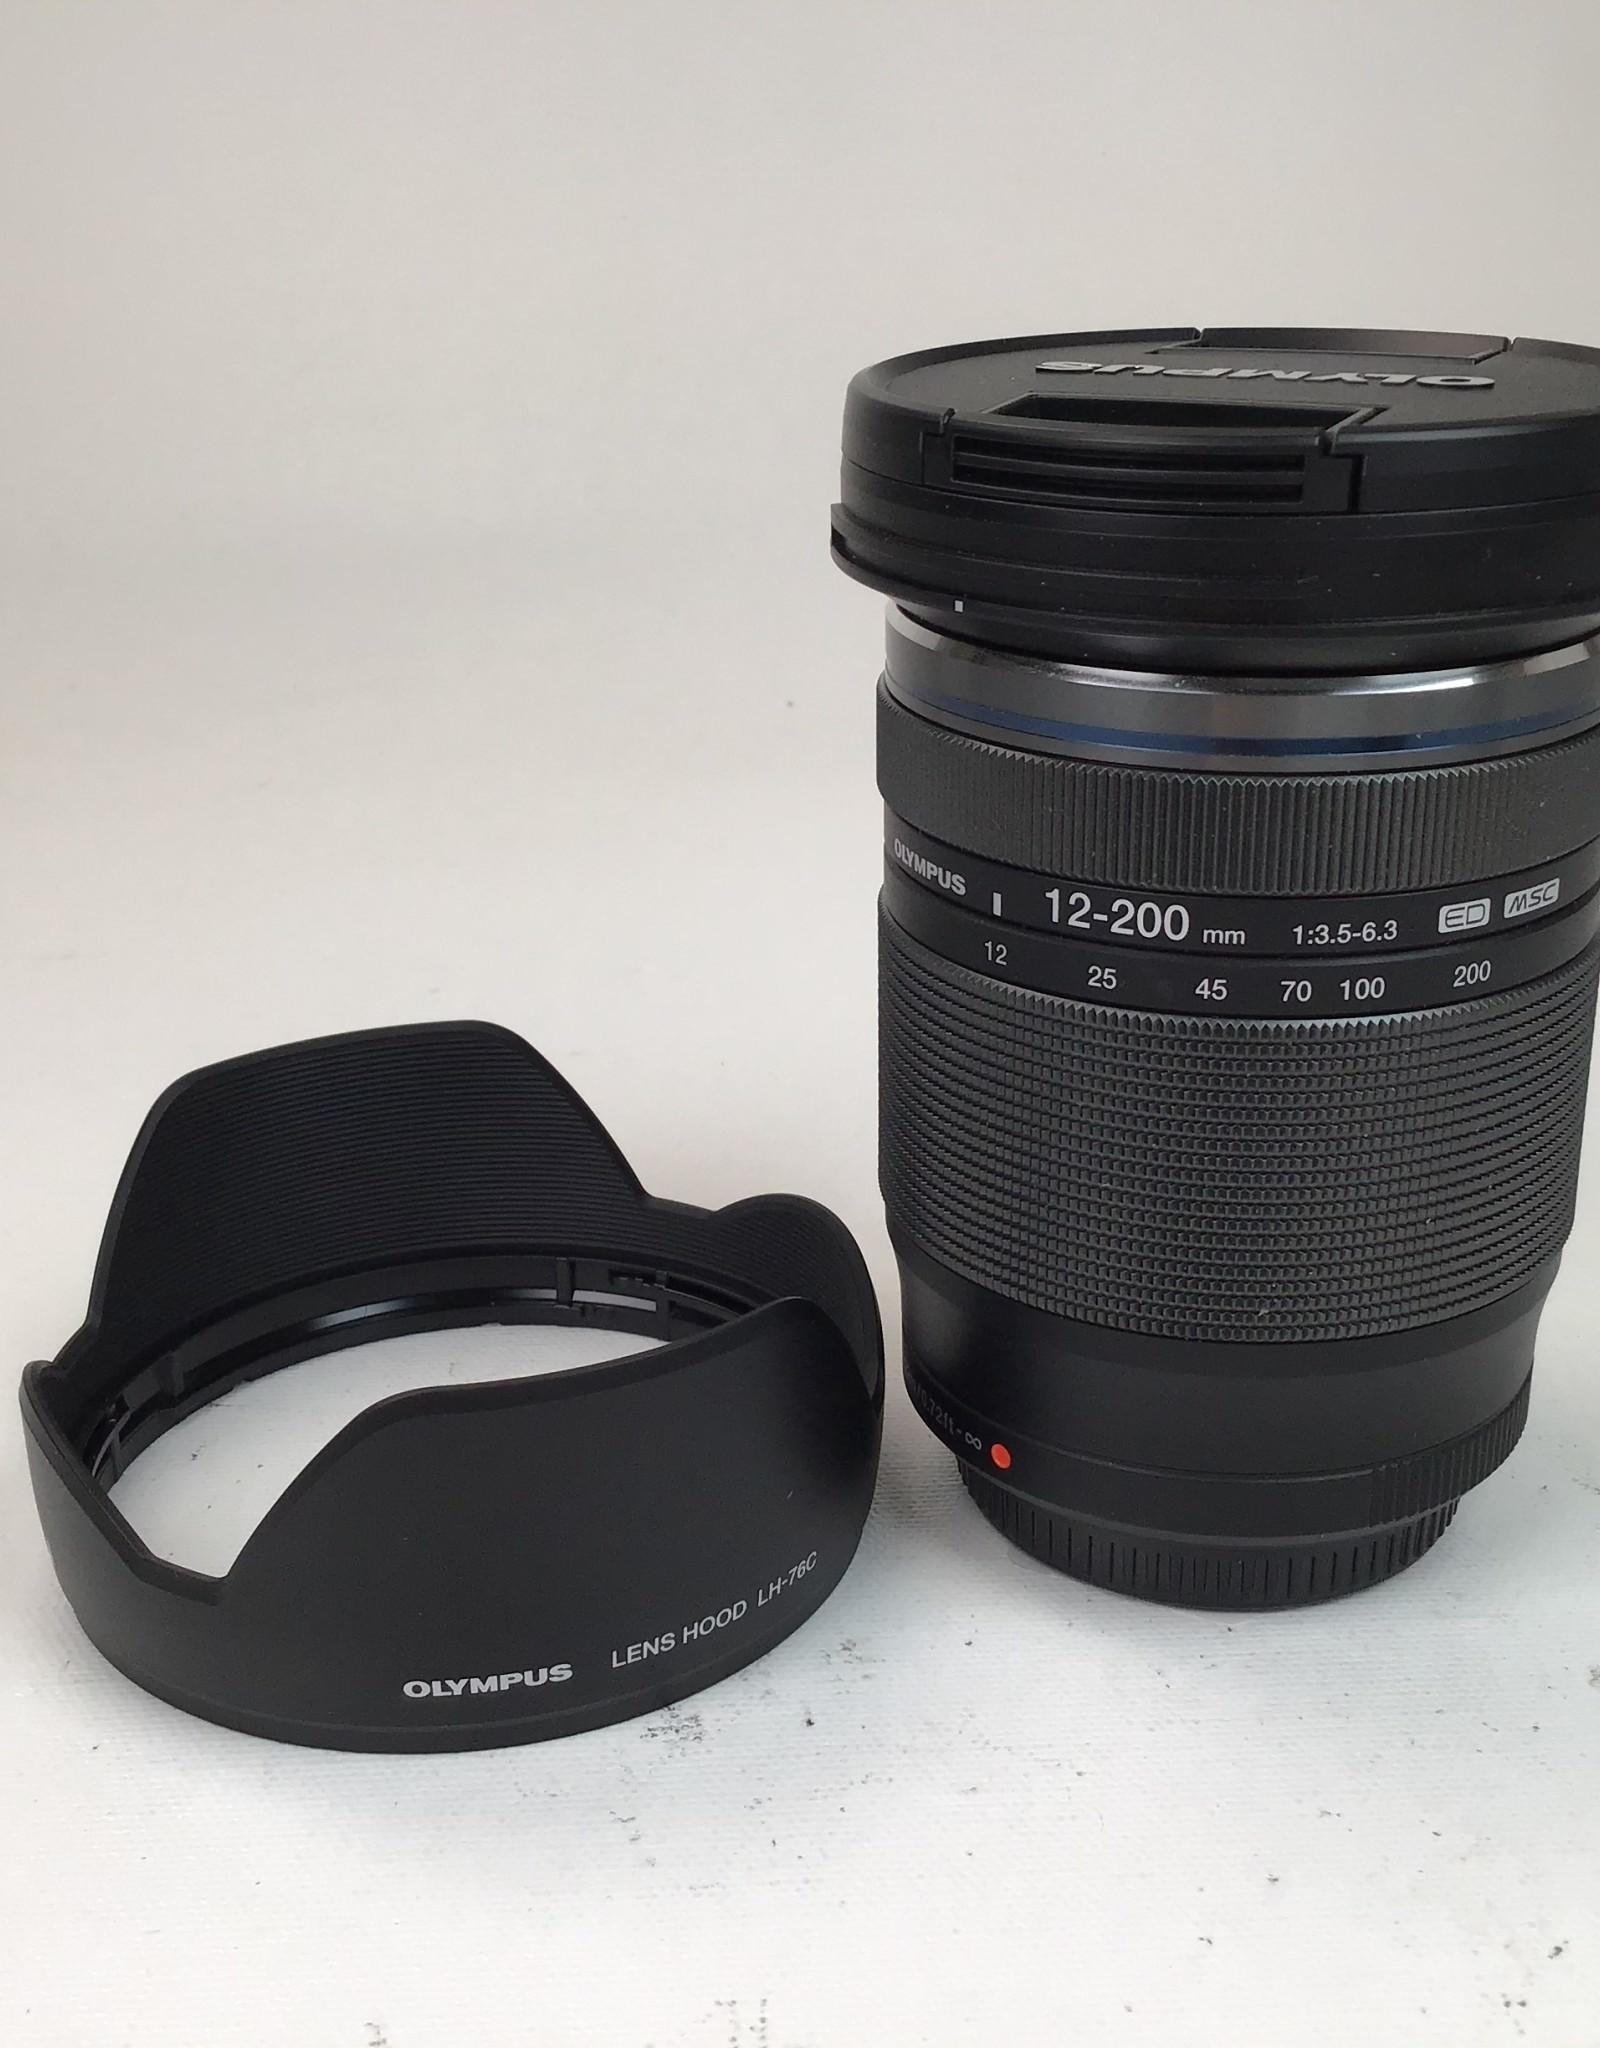 OLYMPUS Olympus M.Zuiko Digital 12-200mm f:3.5-6.3 lens Used Ex+